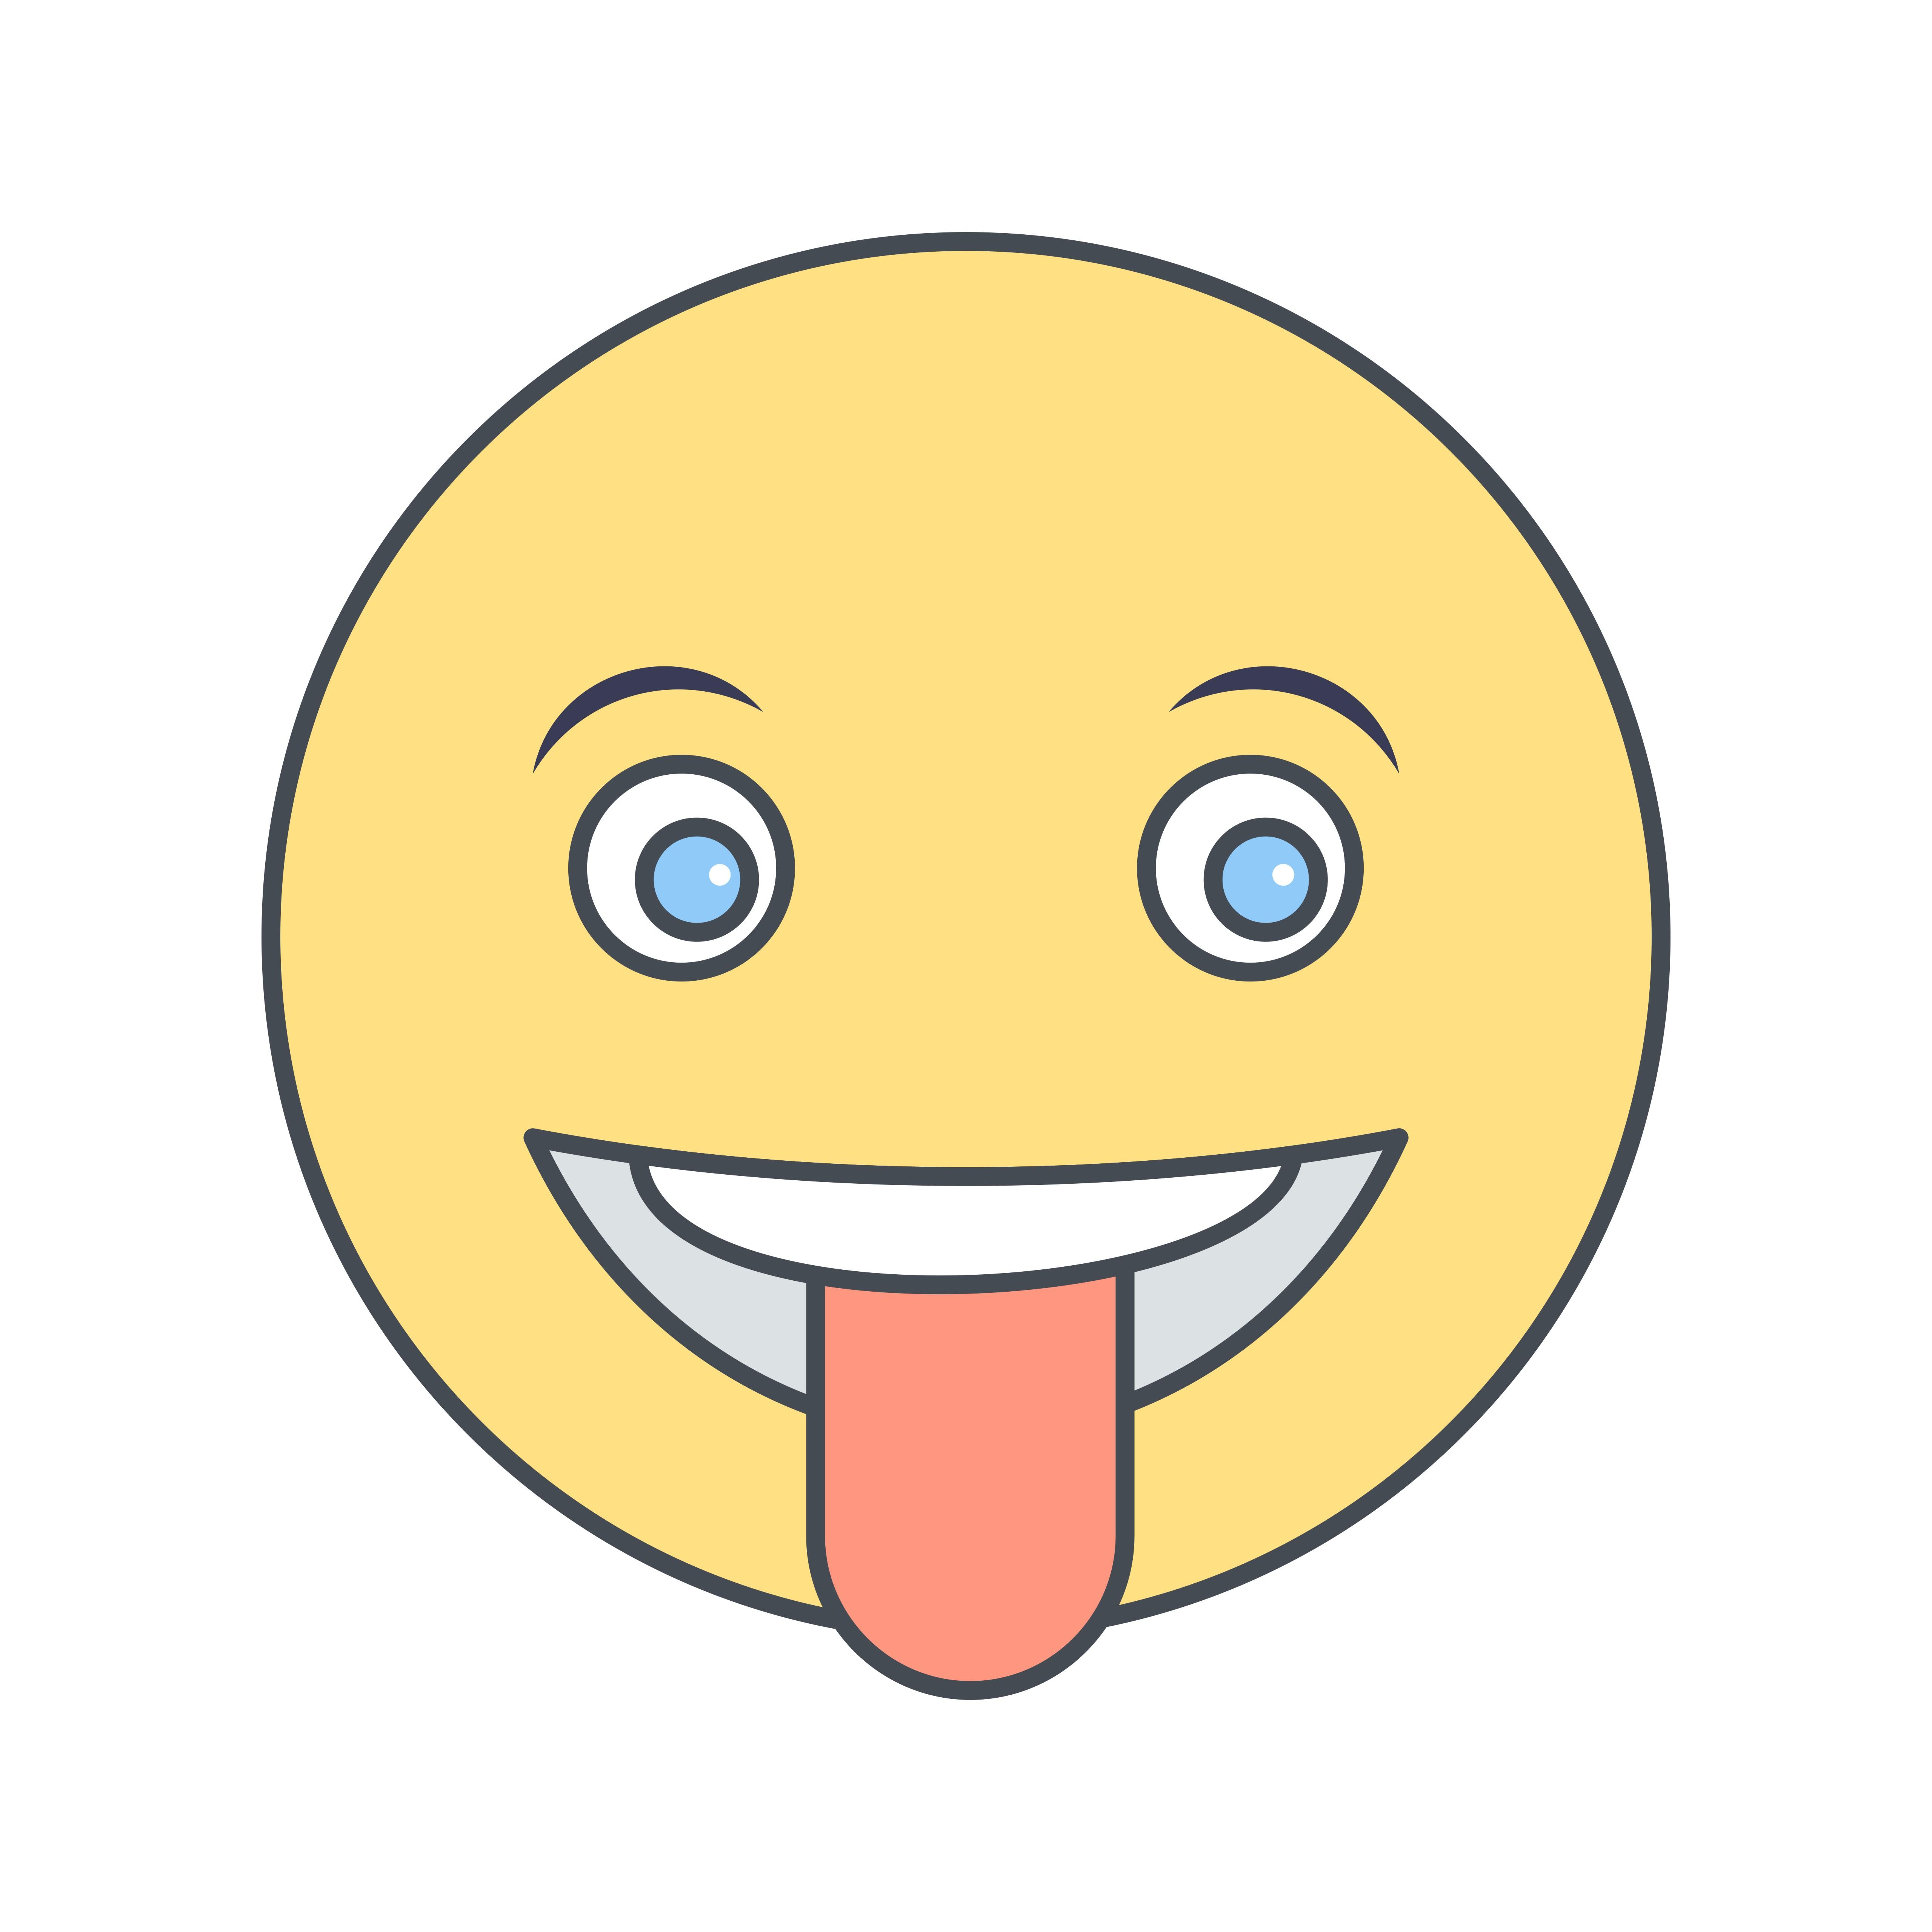 Tongue Emoji Vector Icon - Download Free Vectors, Clipart ...